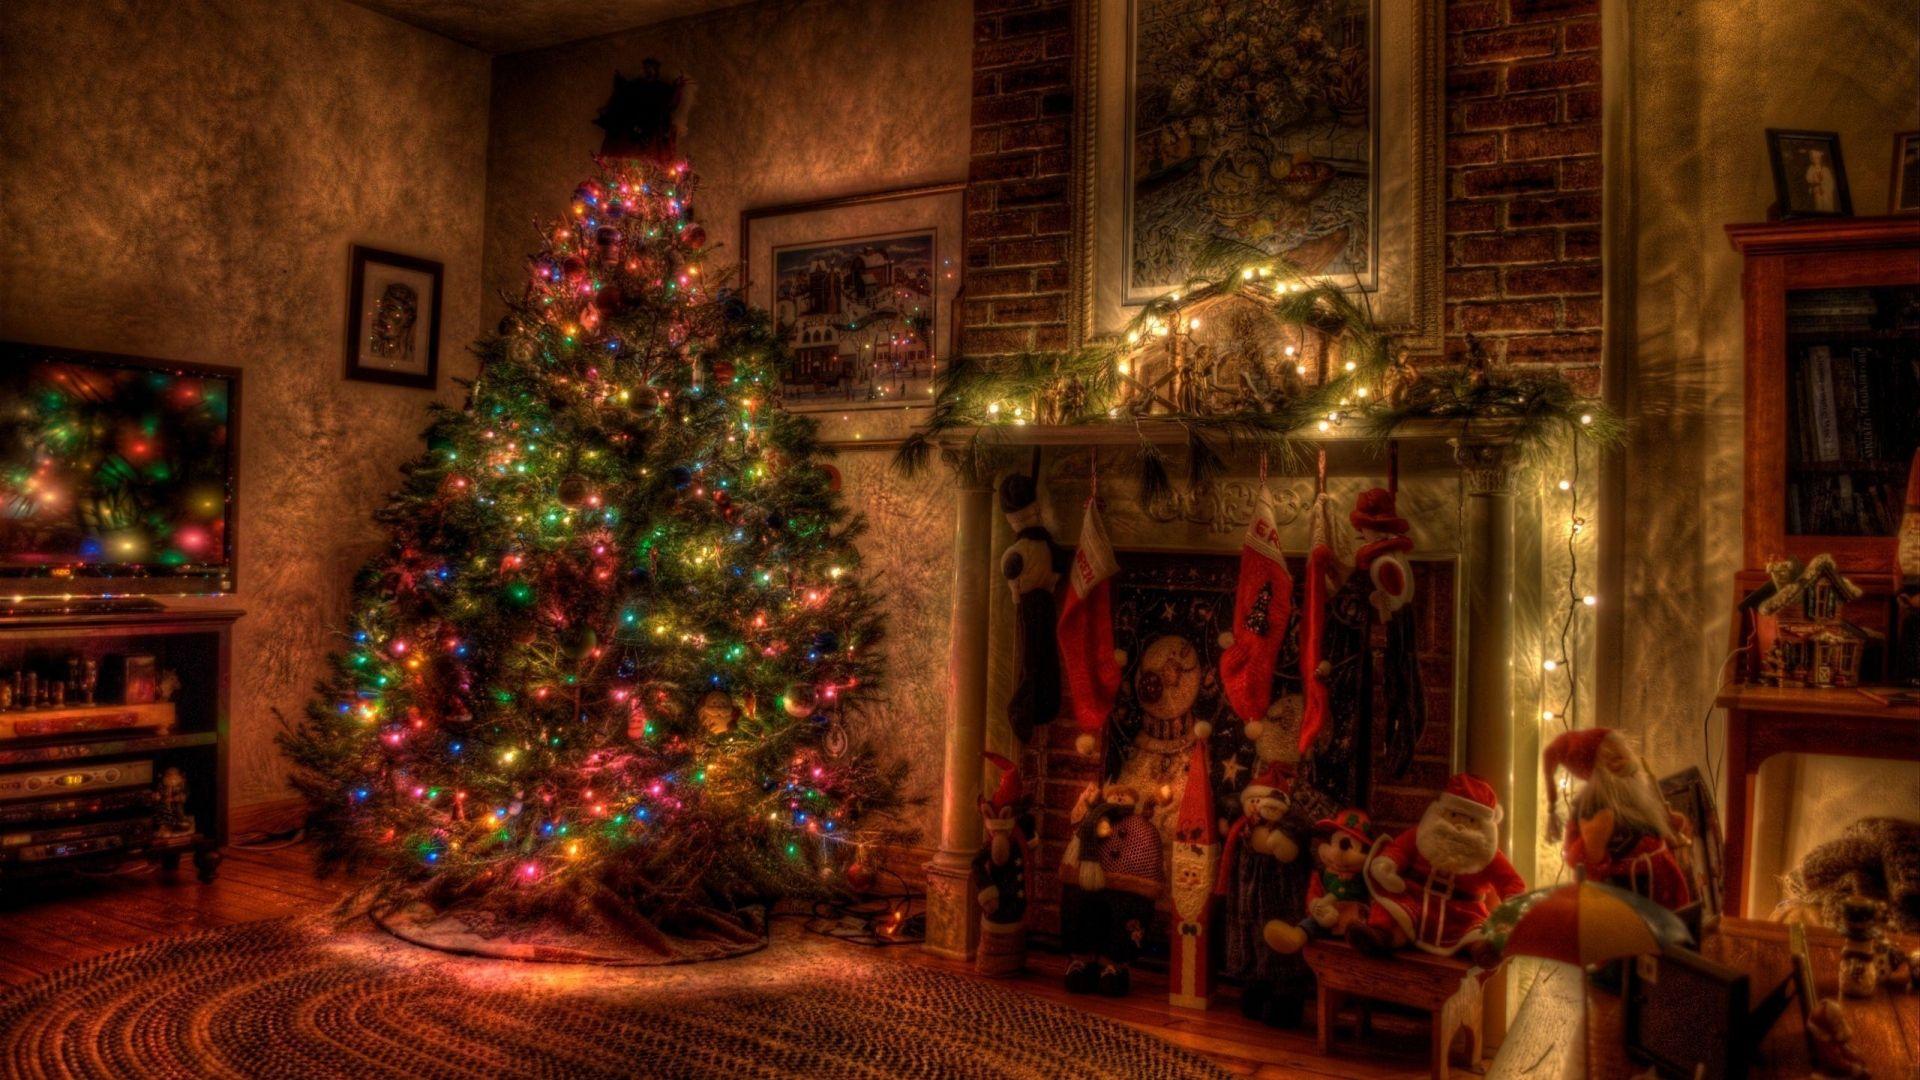 1920x1080 Wallpaper tree christmas holiday garland fireplace 1920x1080